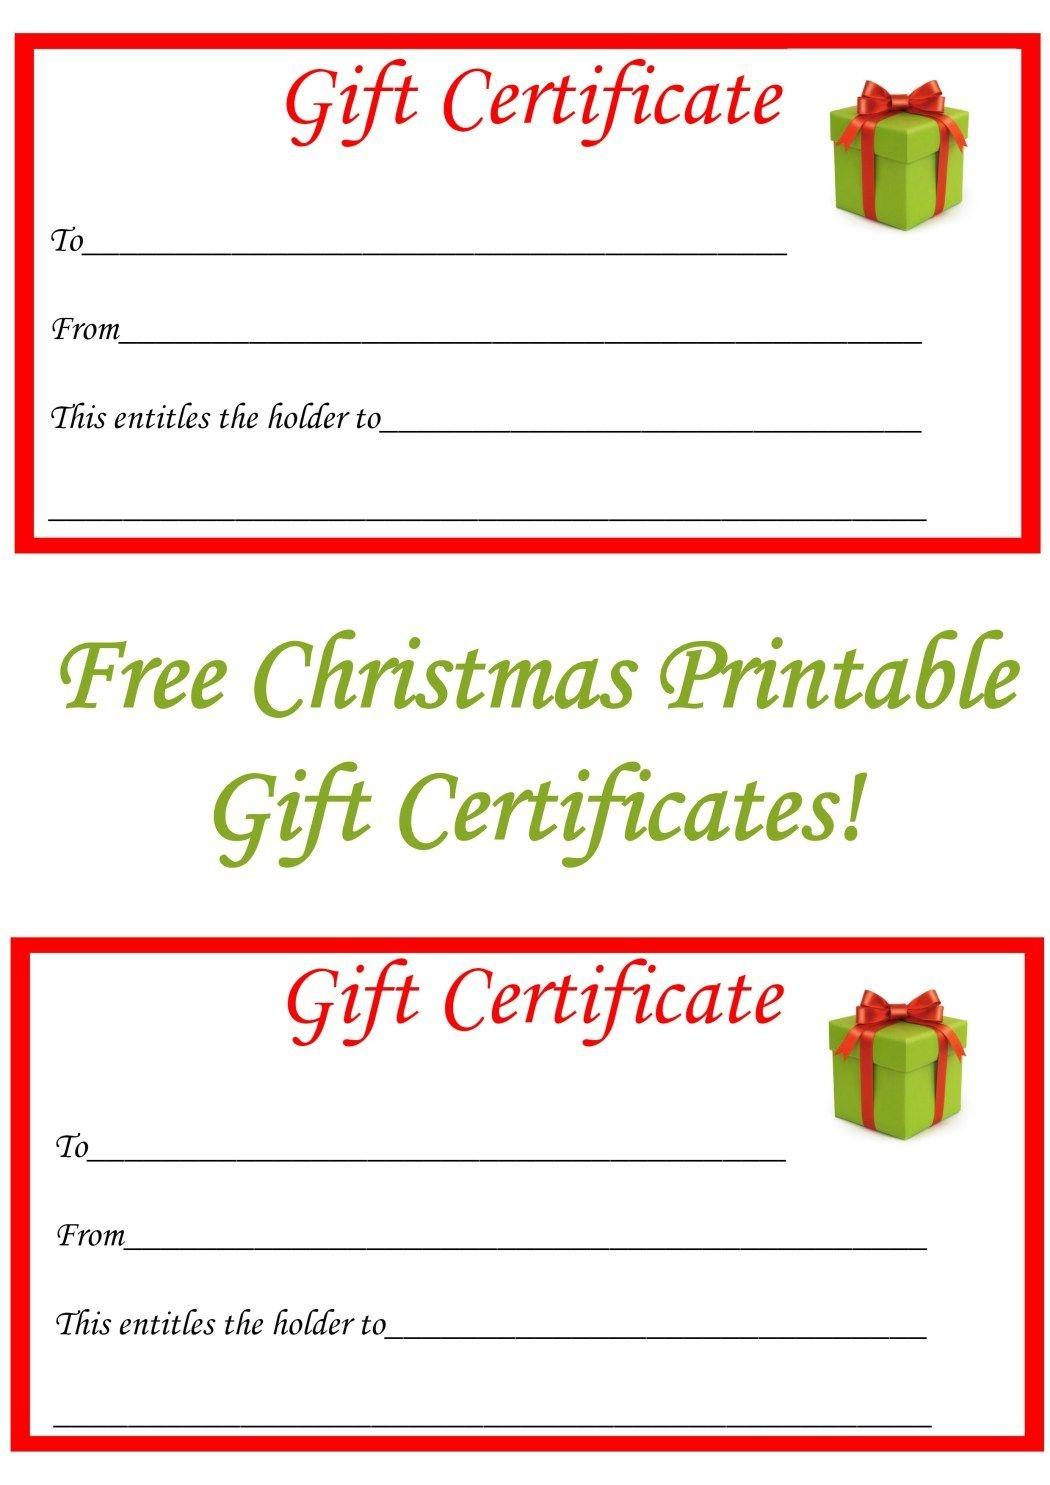 Free Christmas Printable Gift Certificates   Gift Ideas   Christmas - Free Printable Gift Certificates